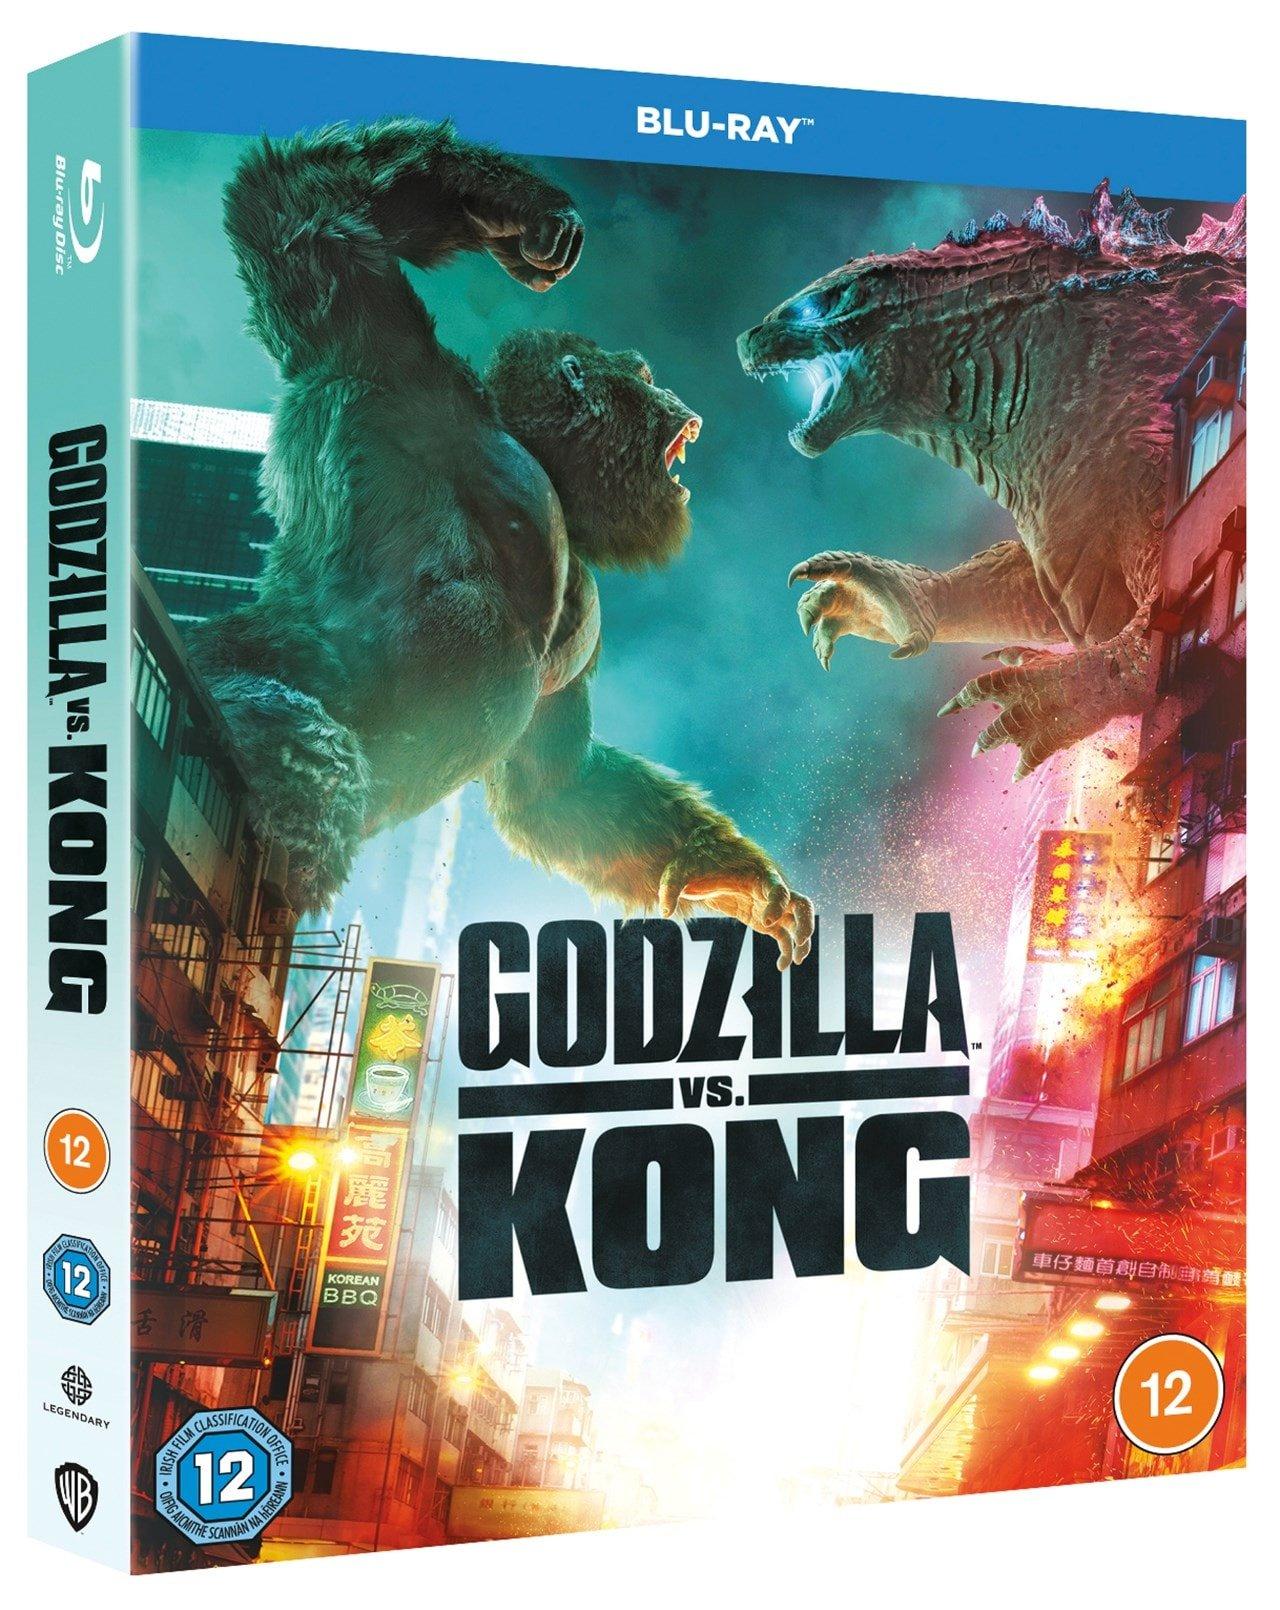 Godzilla vs. Kong poster image